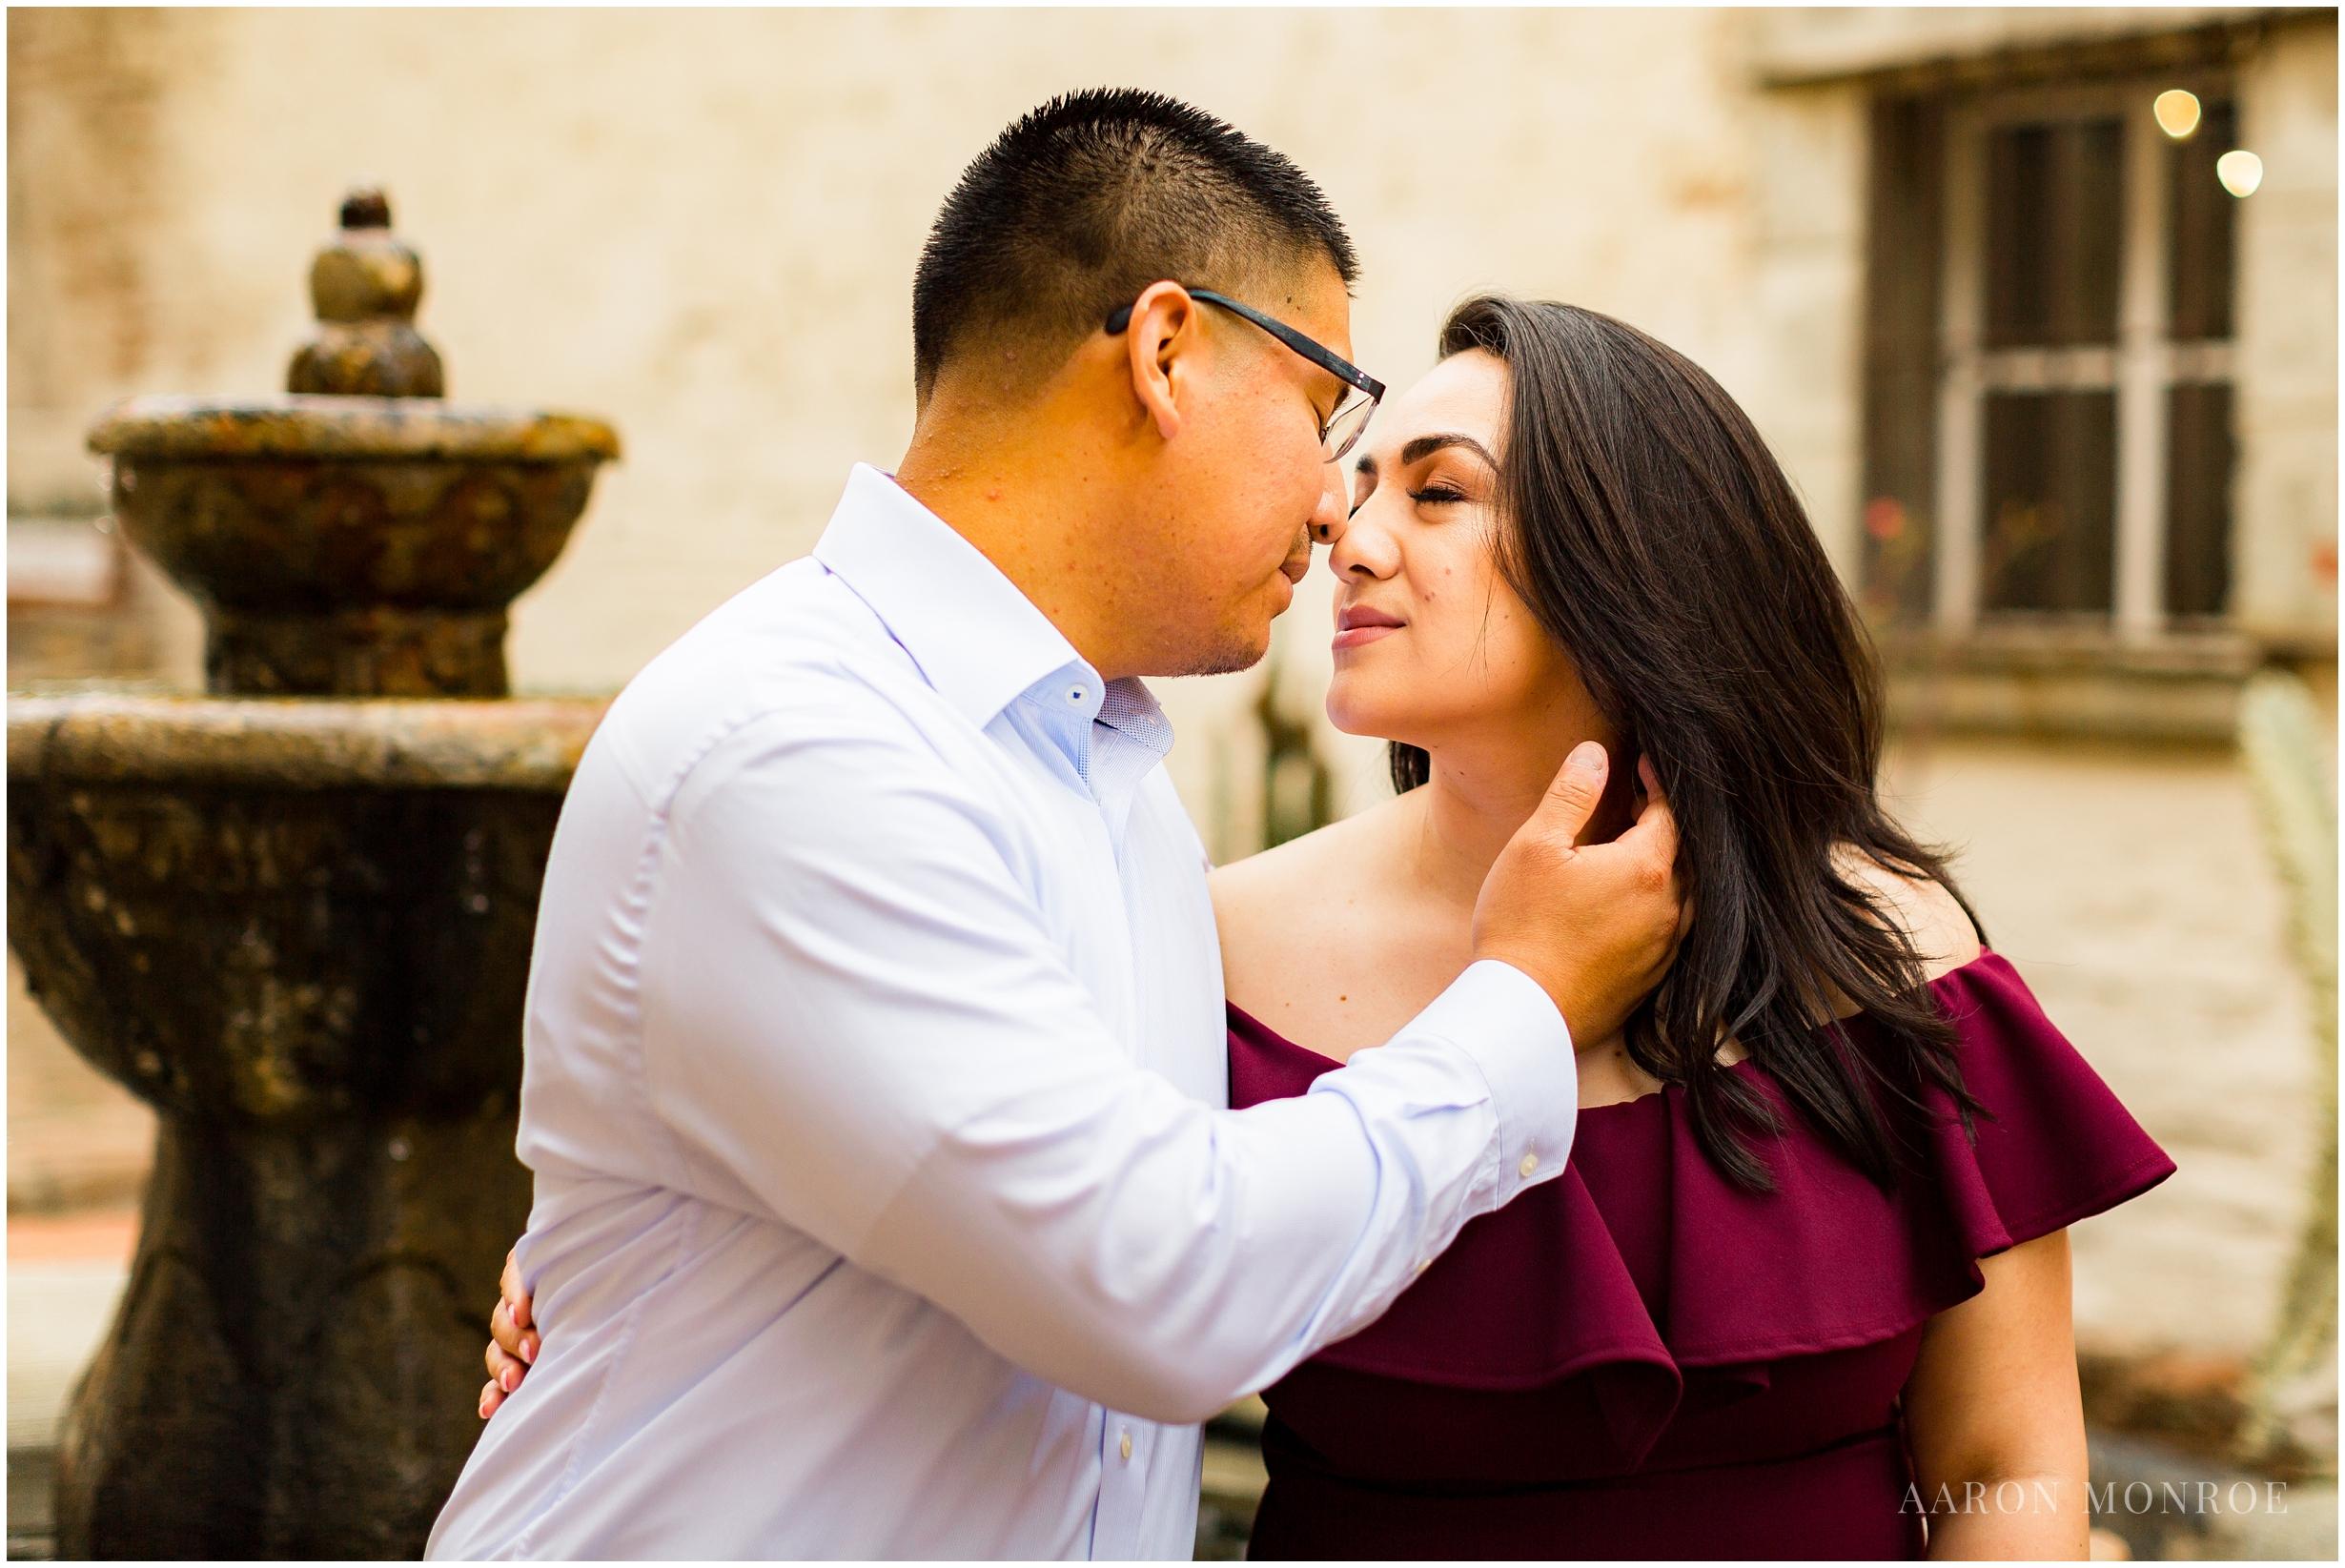 Mission_San_Juan_Capistrano_Engagement_Los_Angeles_Wedding_Photographer_0348.jpg